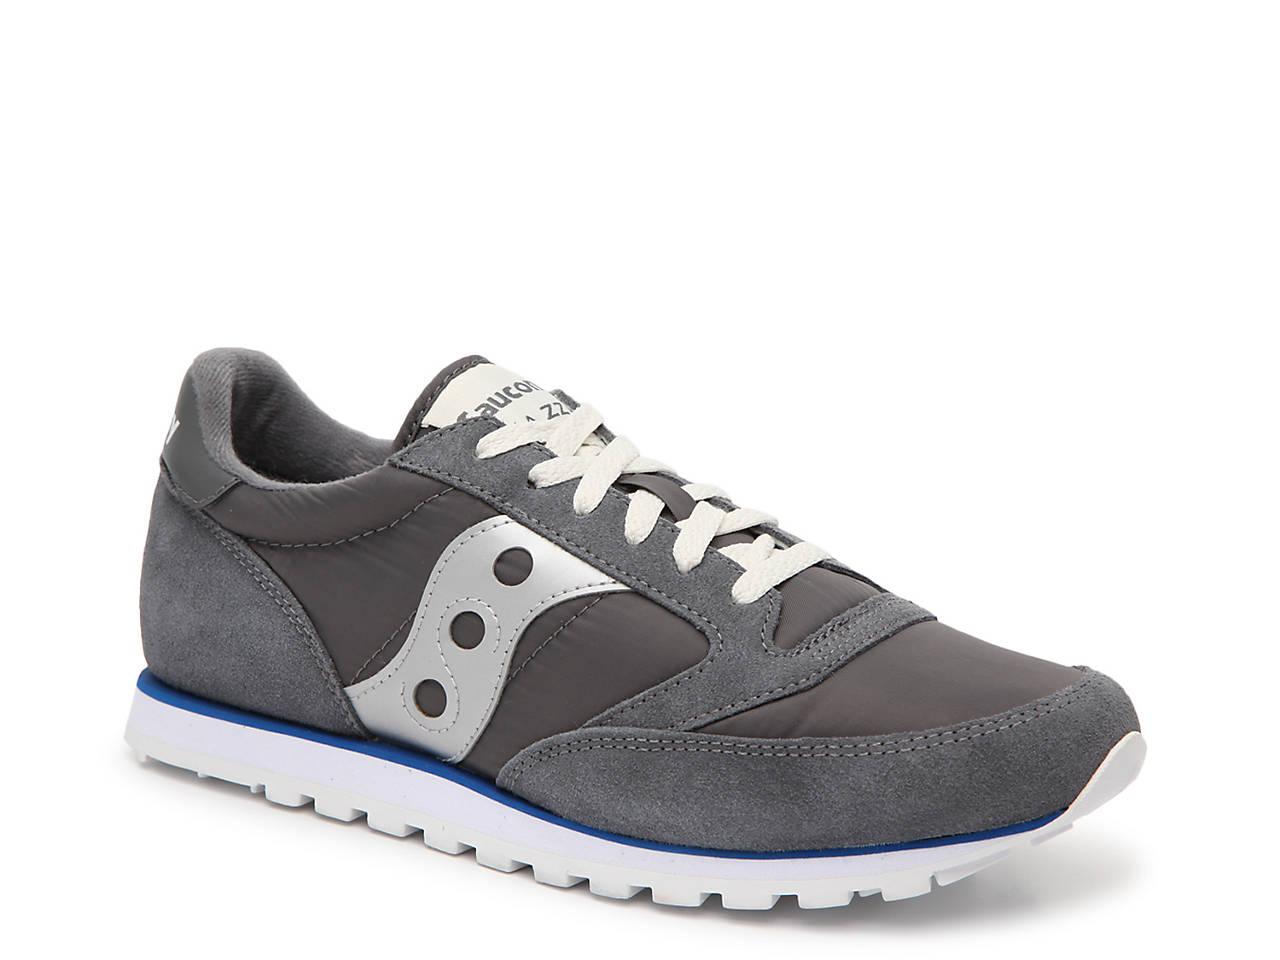 dea2818c7 Saucony Jazz Low Pro Sneaker - Men s Men s Shoes